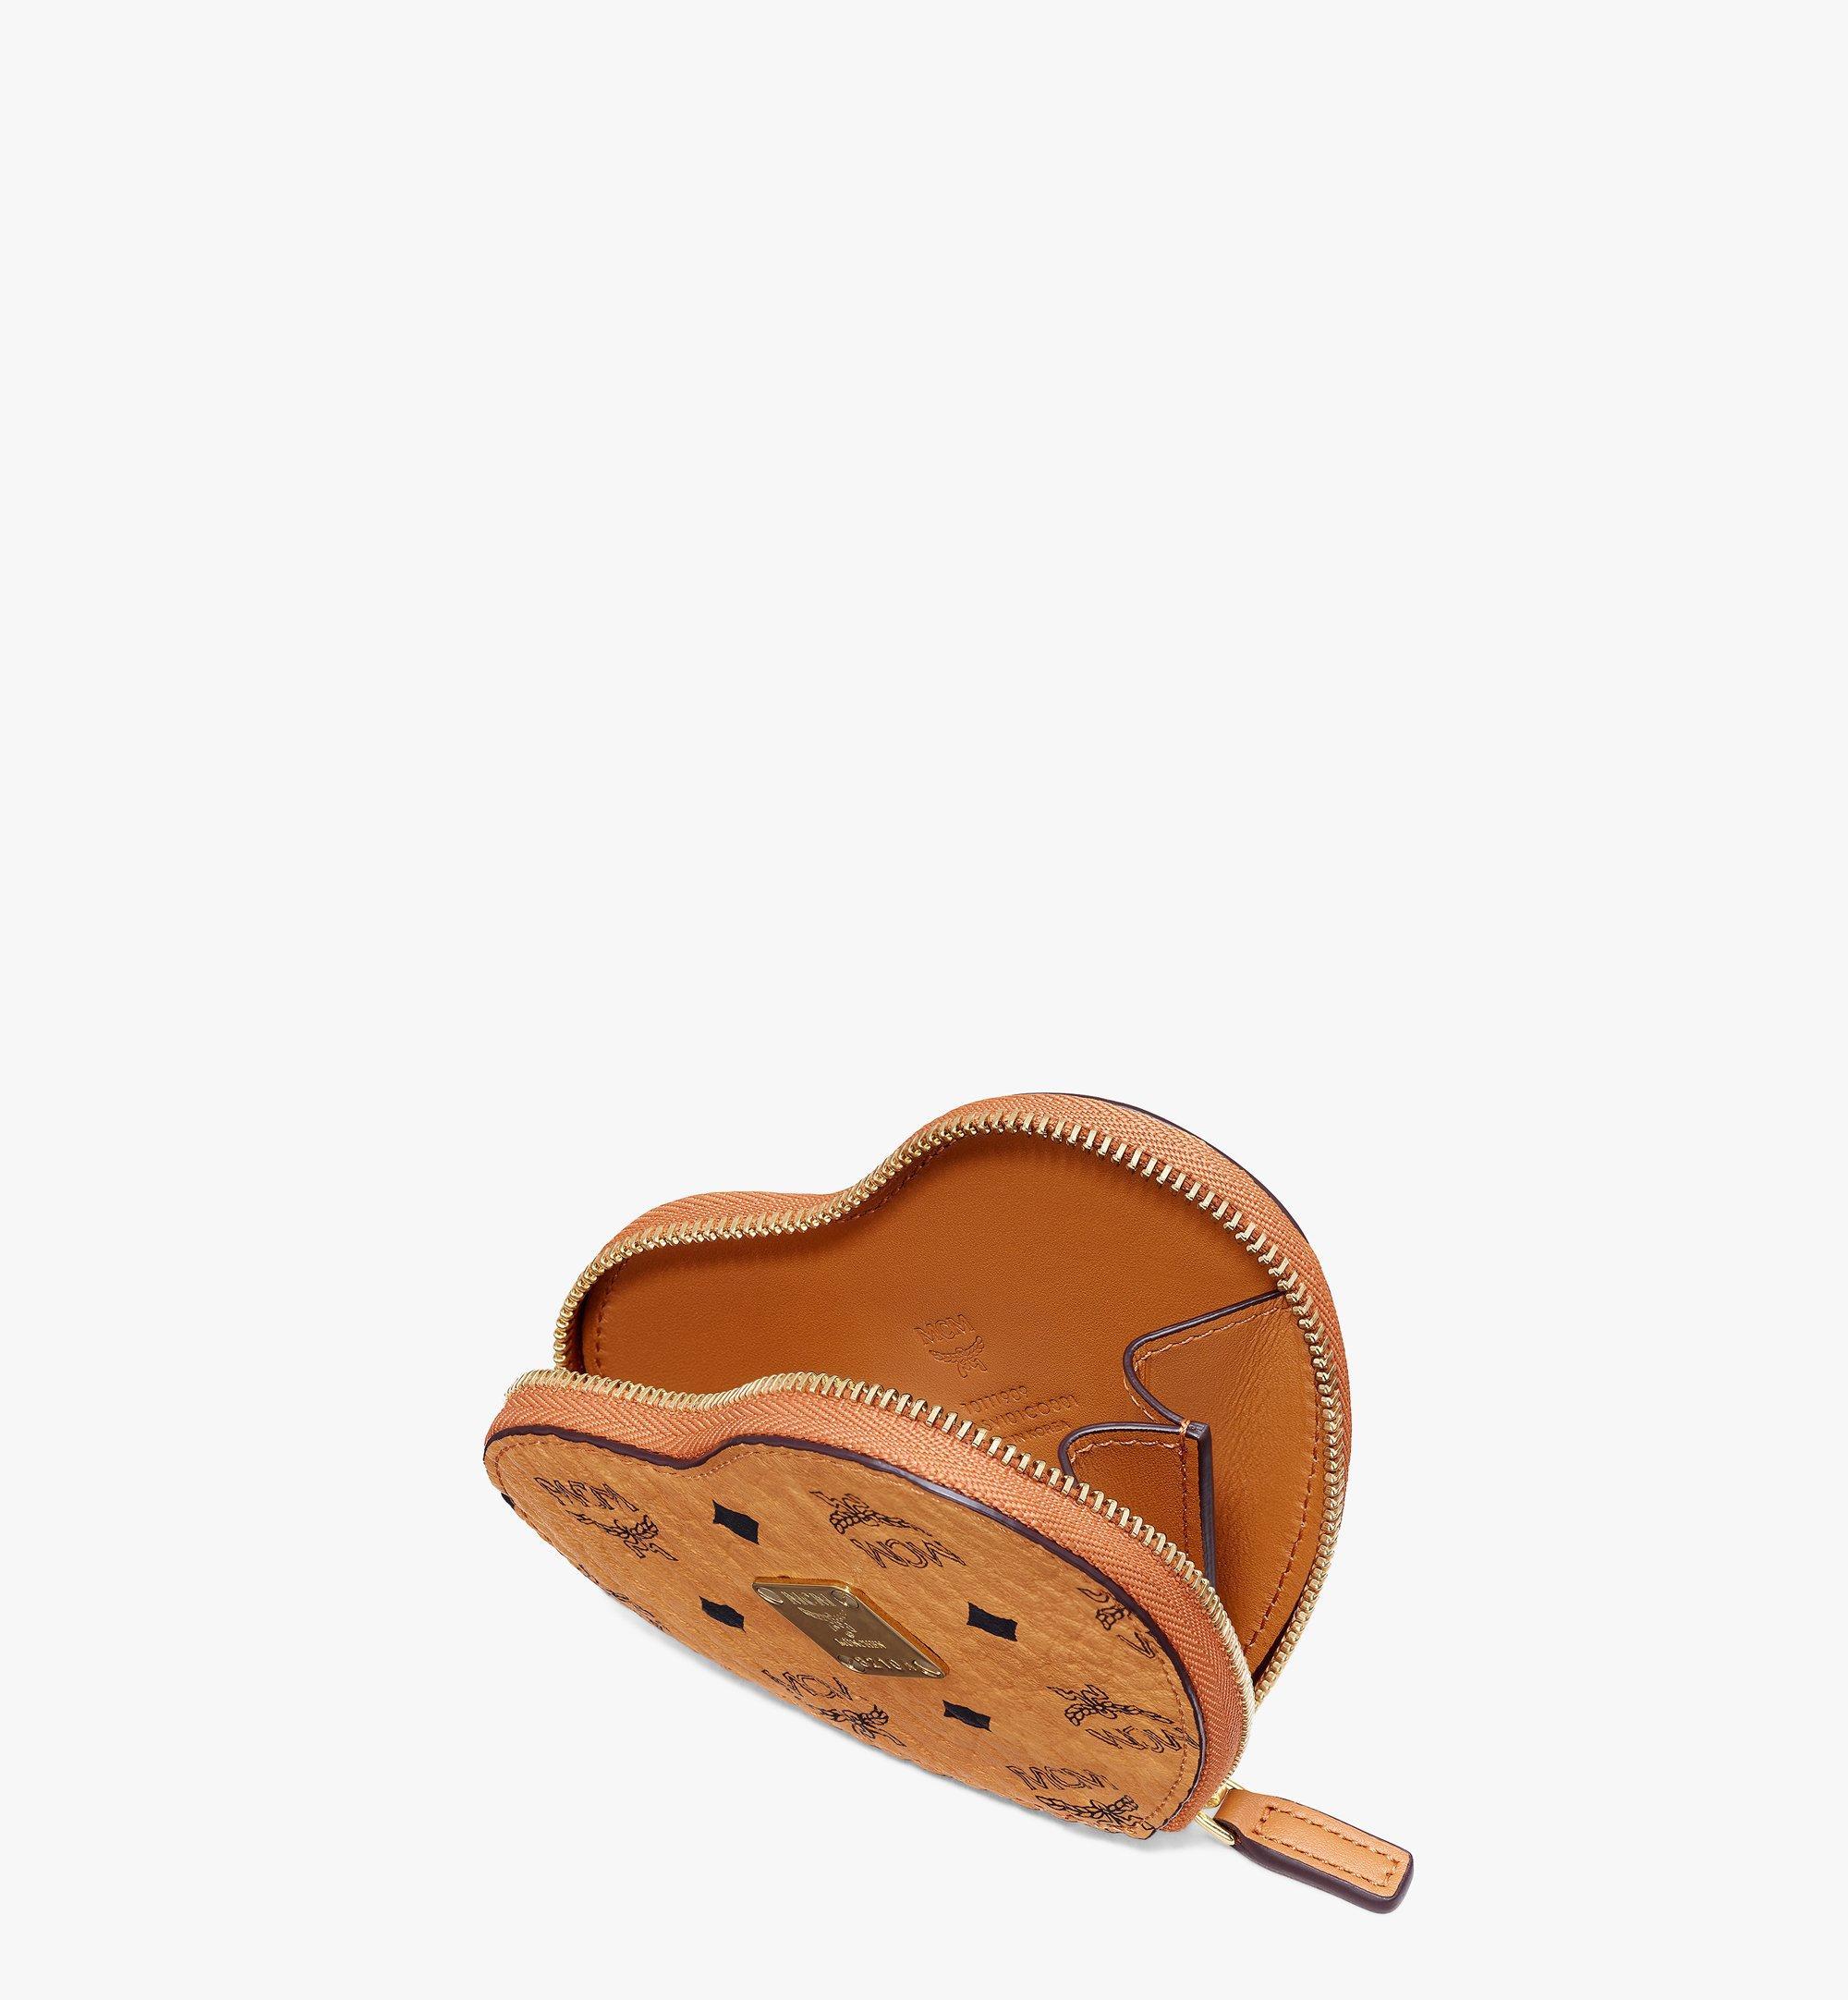 MCM Heart Coin Pouch Charm in Visetos Cognac MYIASVI01CO001 Alternate View 2